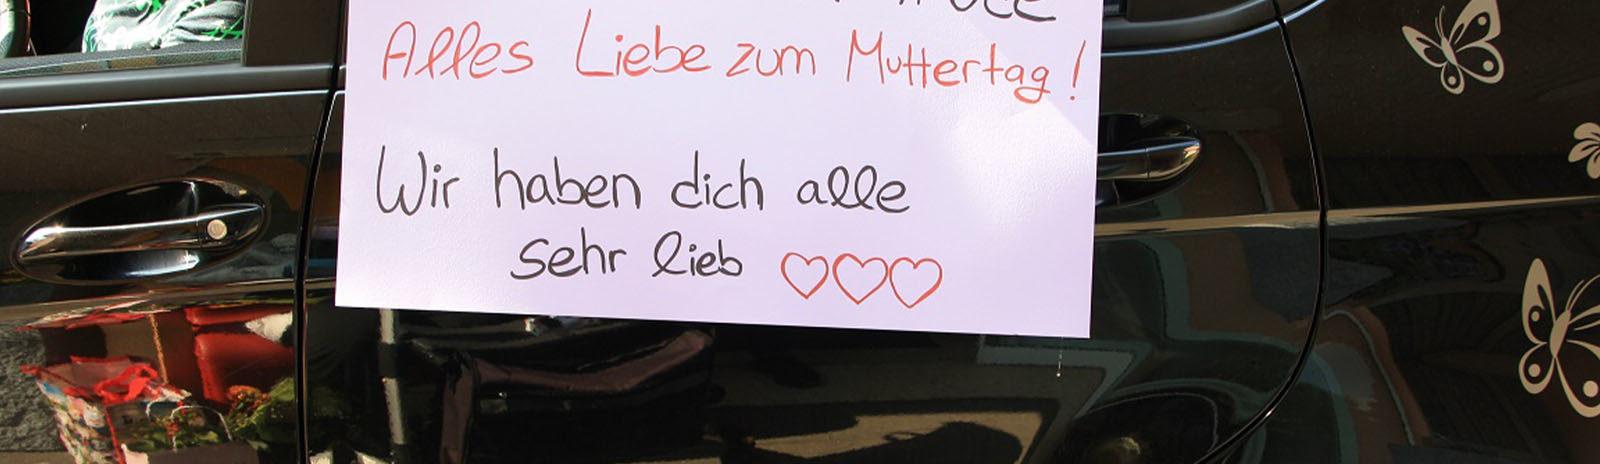 Eifelhaus_Muttertagsdrive-In_slider